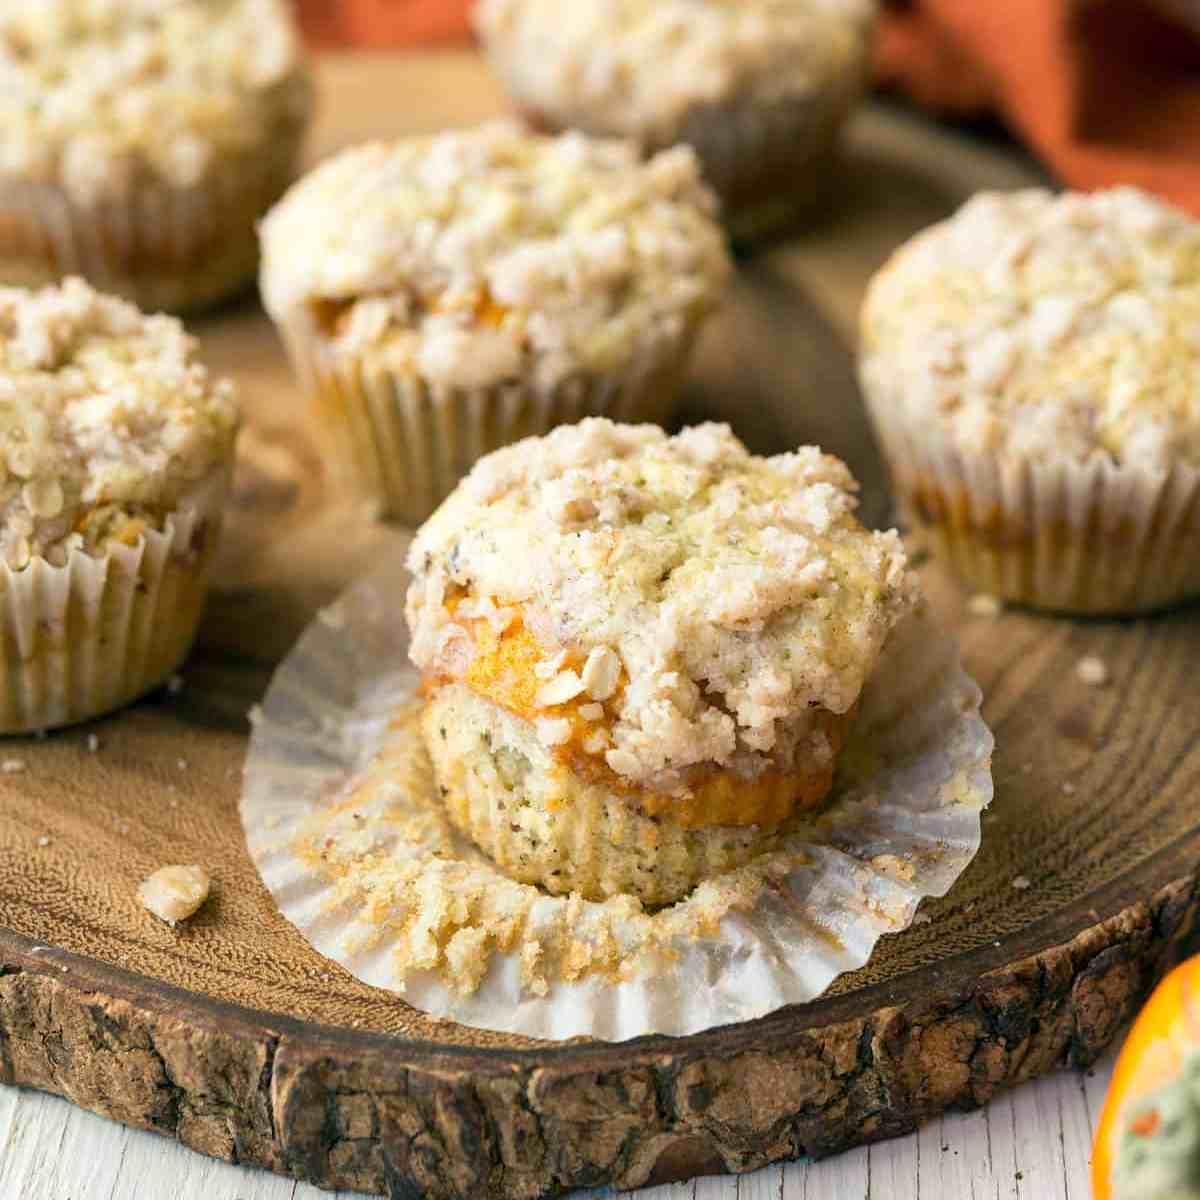 persimmoncakes-header